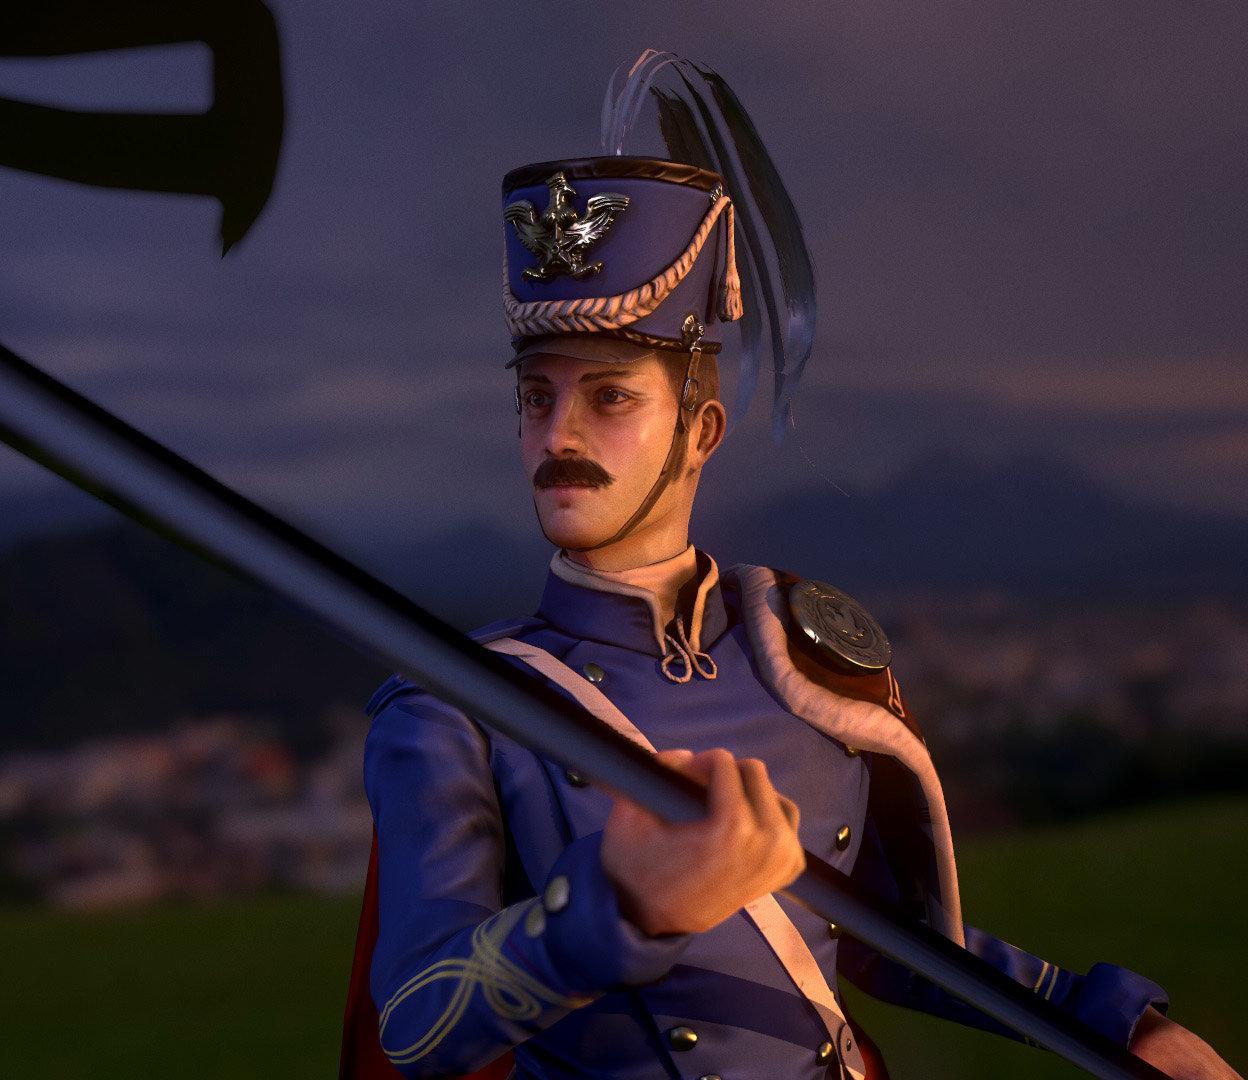 Luis santander soldier 1